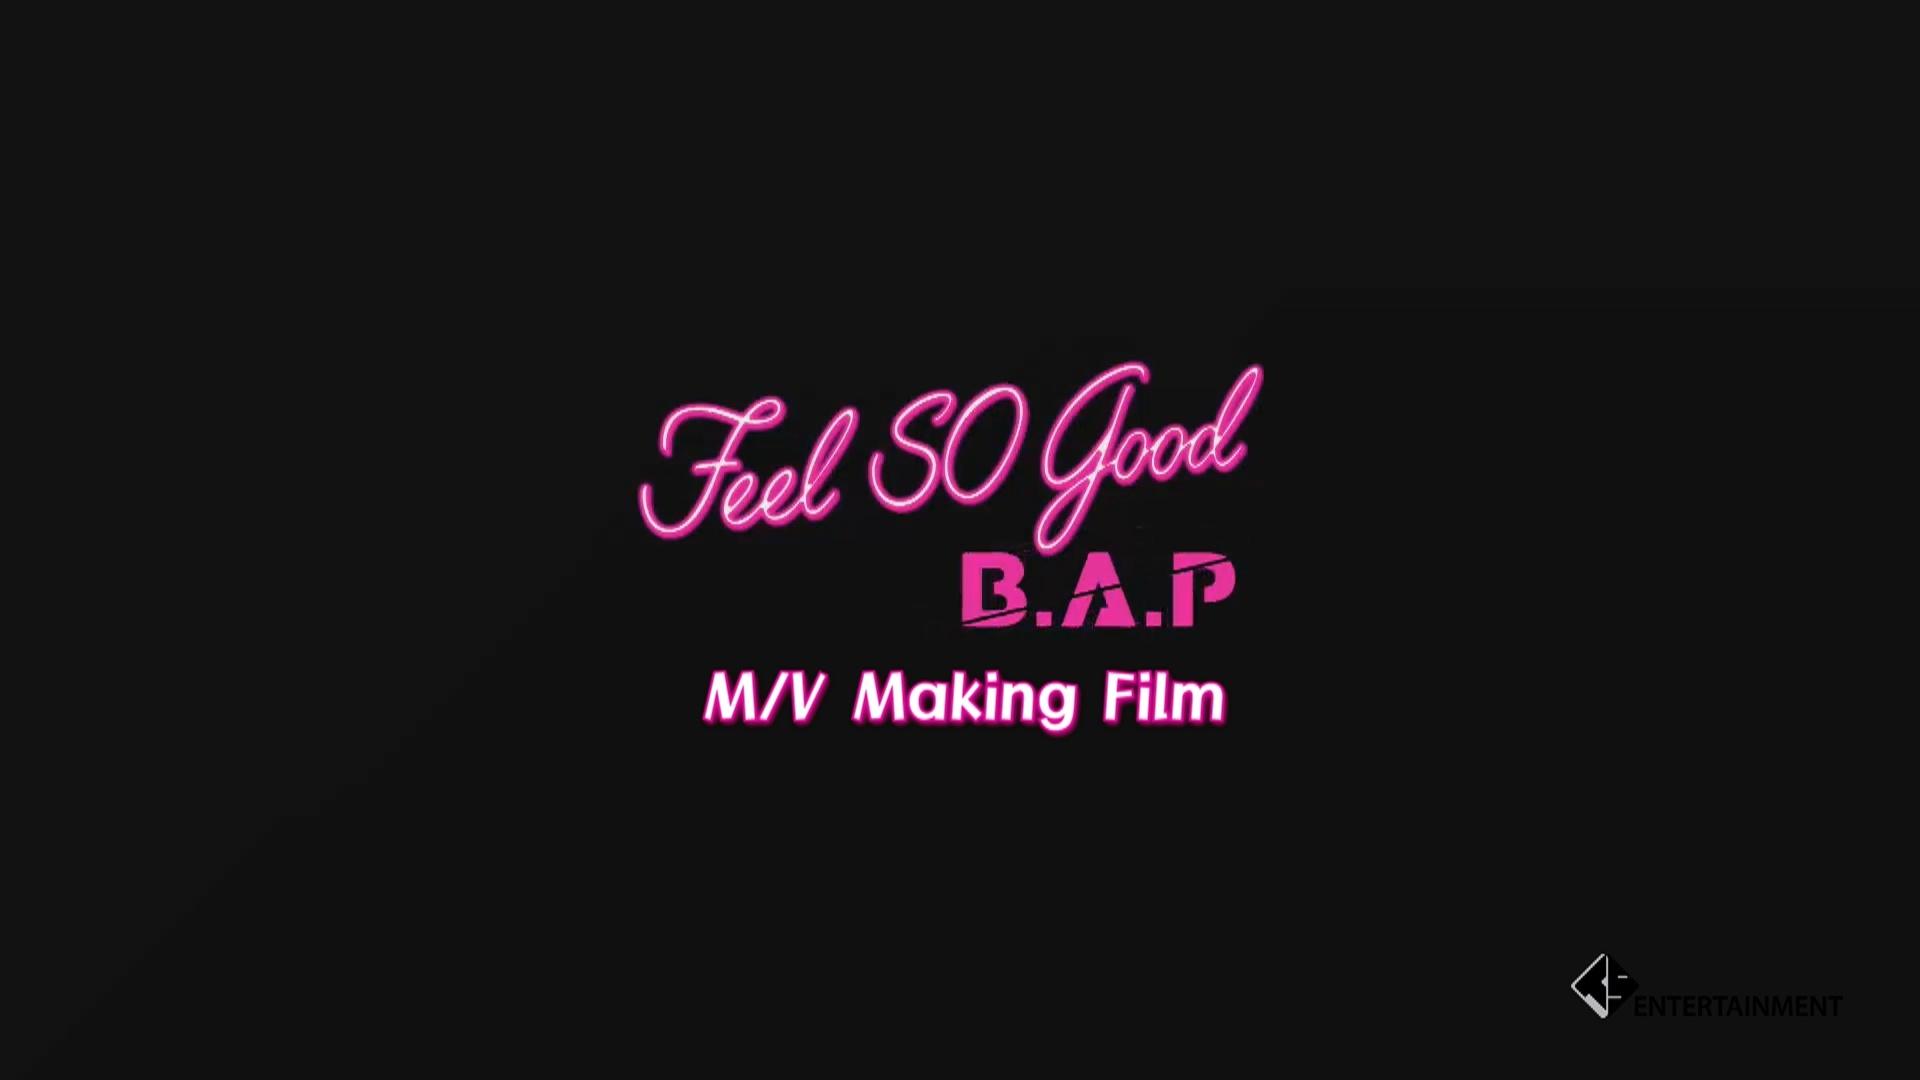 B.A.P - Feel So Good M/V Making Film